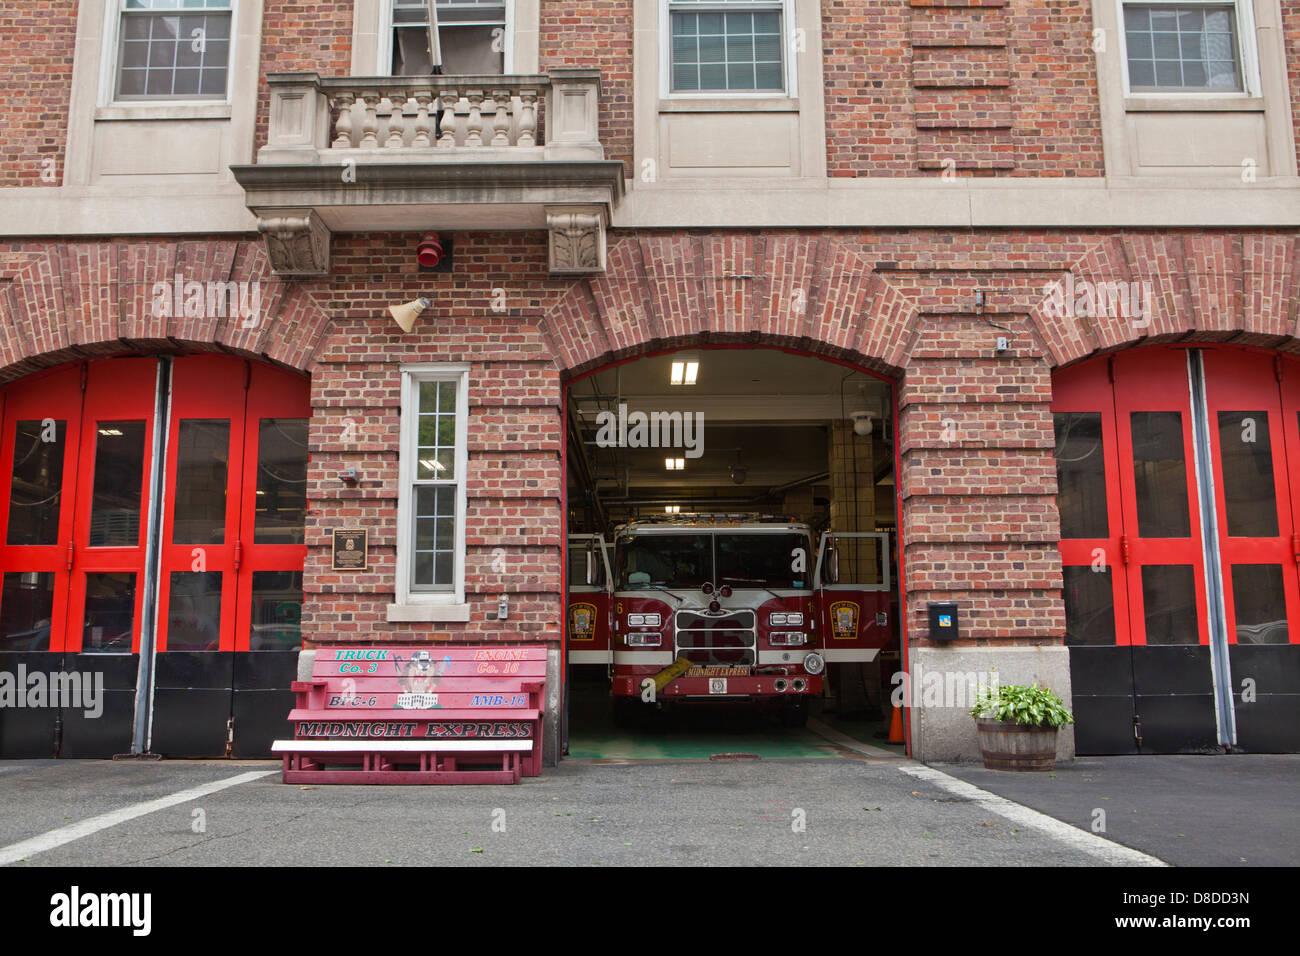 Fire station  - Washington, DC USA - Stock Image